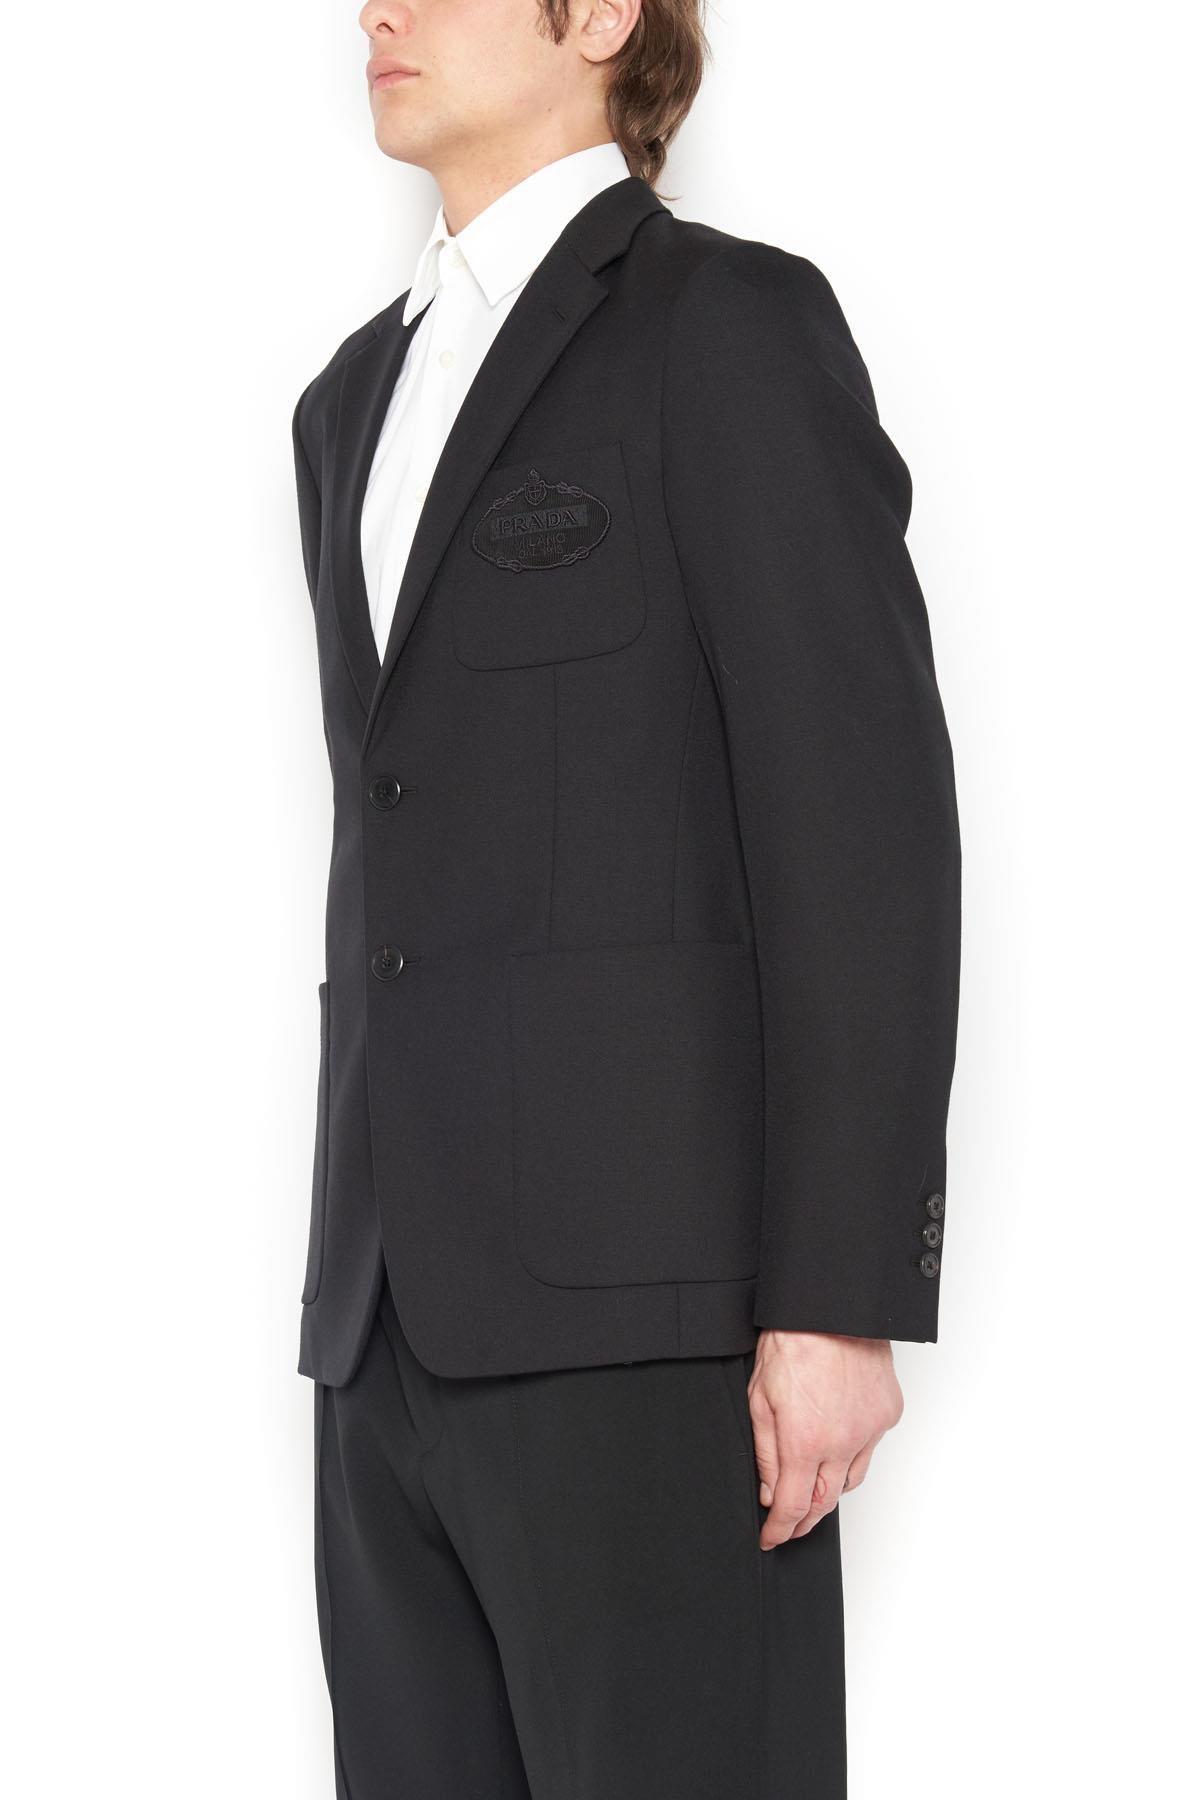 new style 610c6 34a0c prada giacca destrutturata su www.julian-fashion.com - 48565 ...